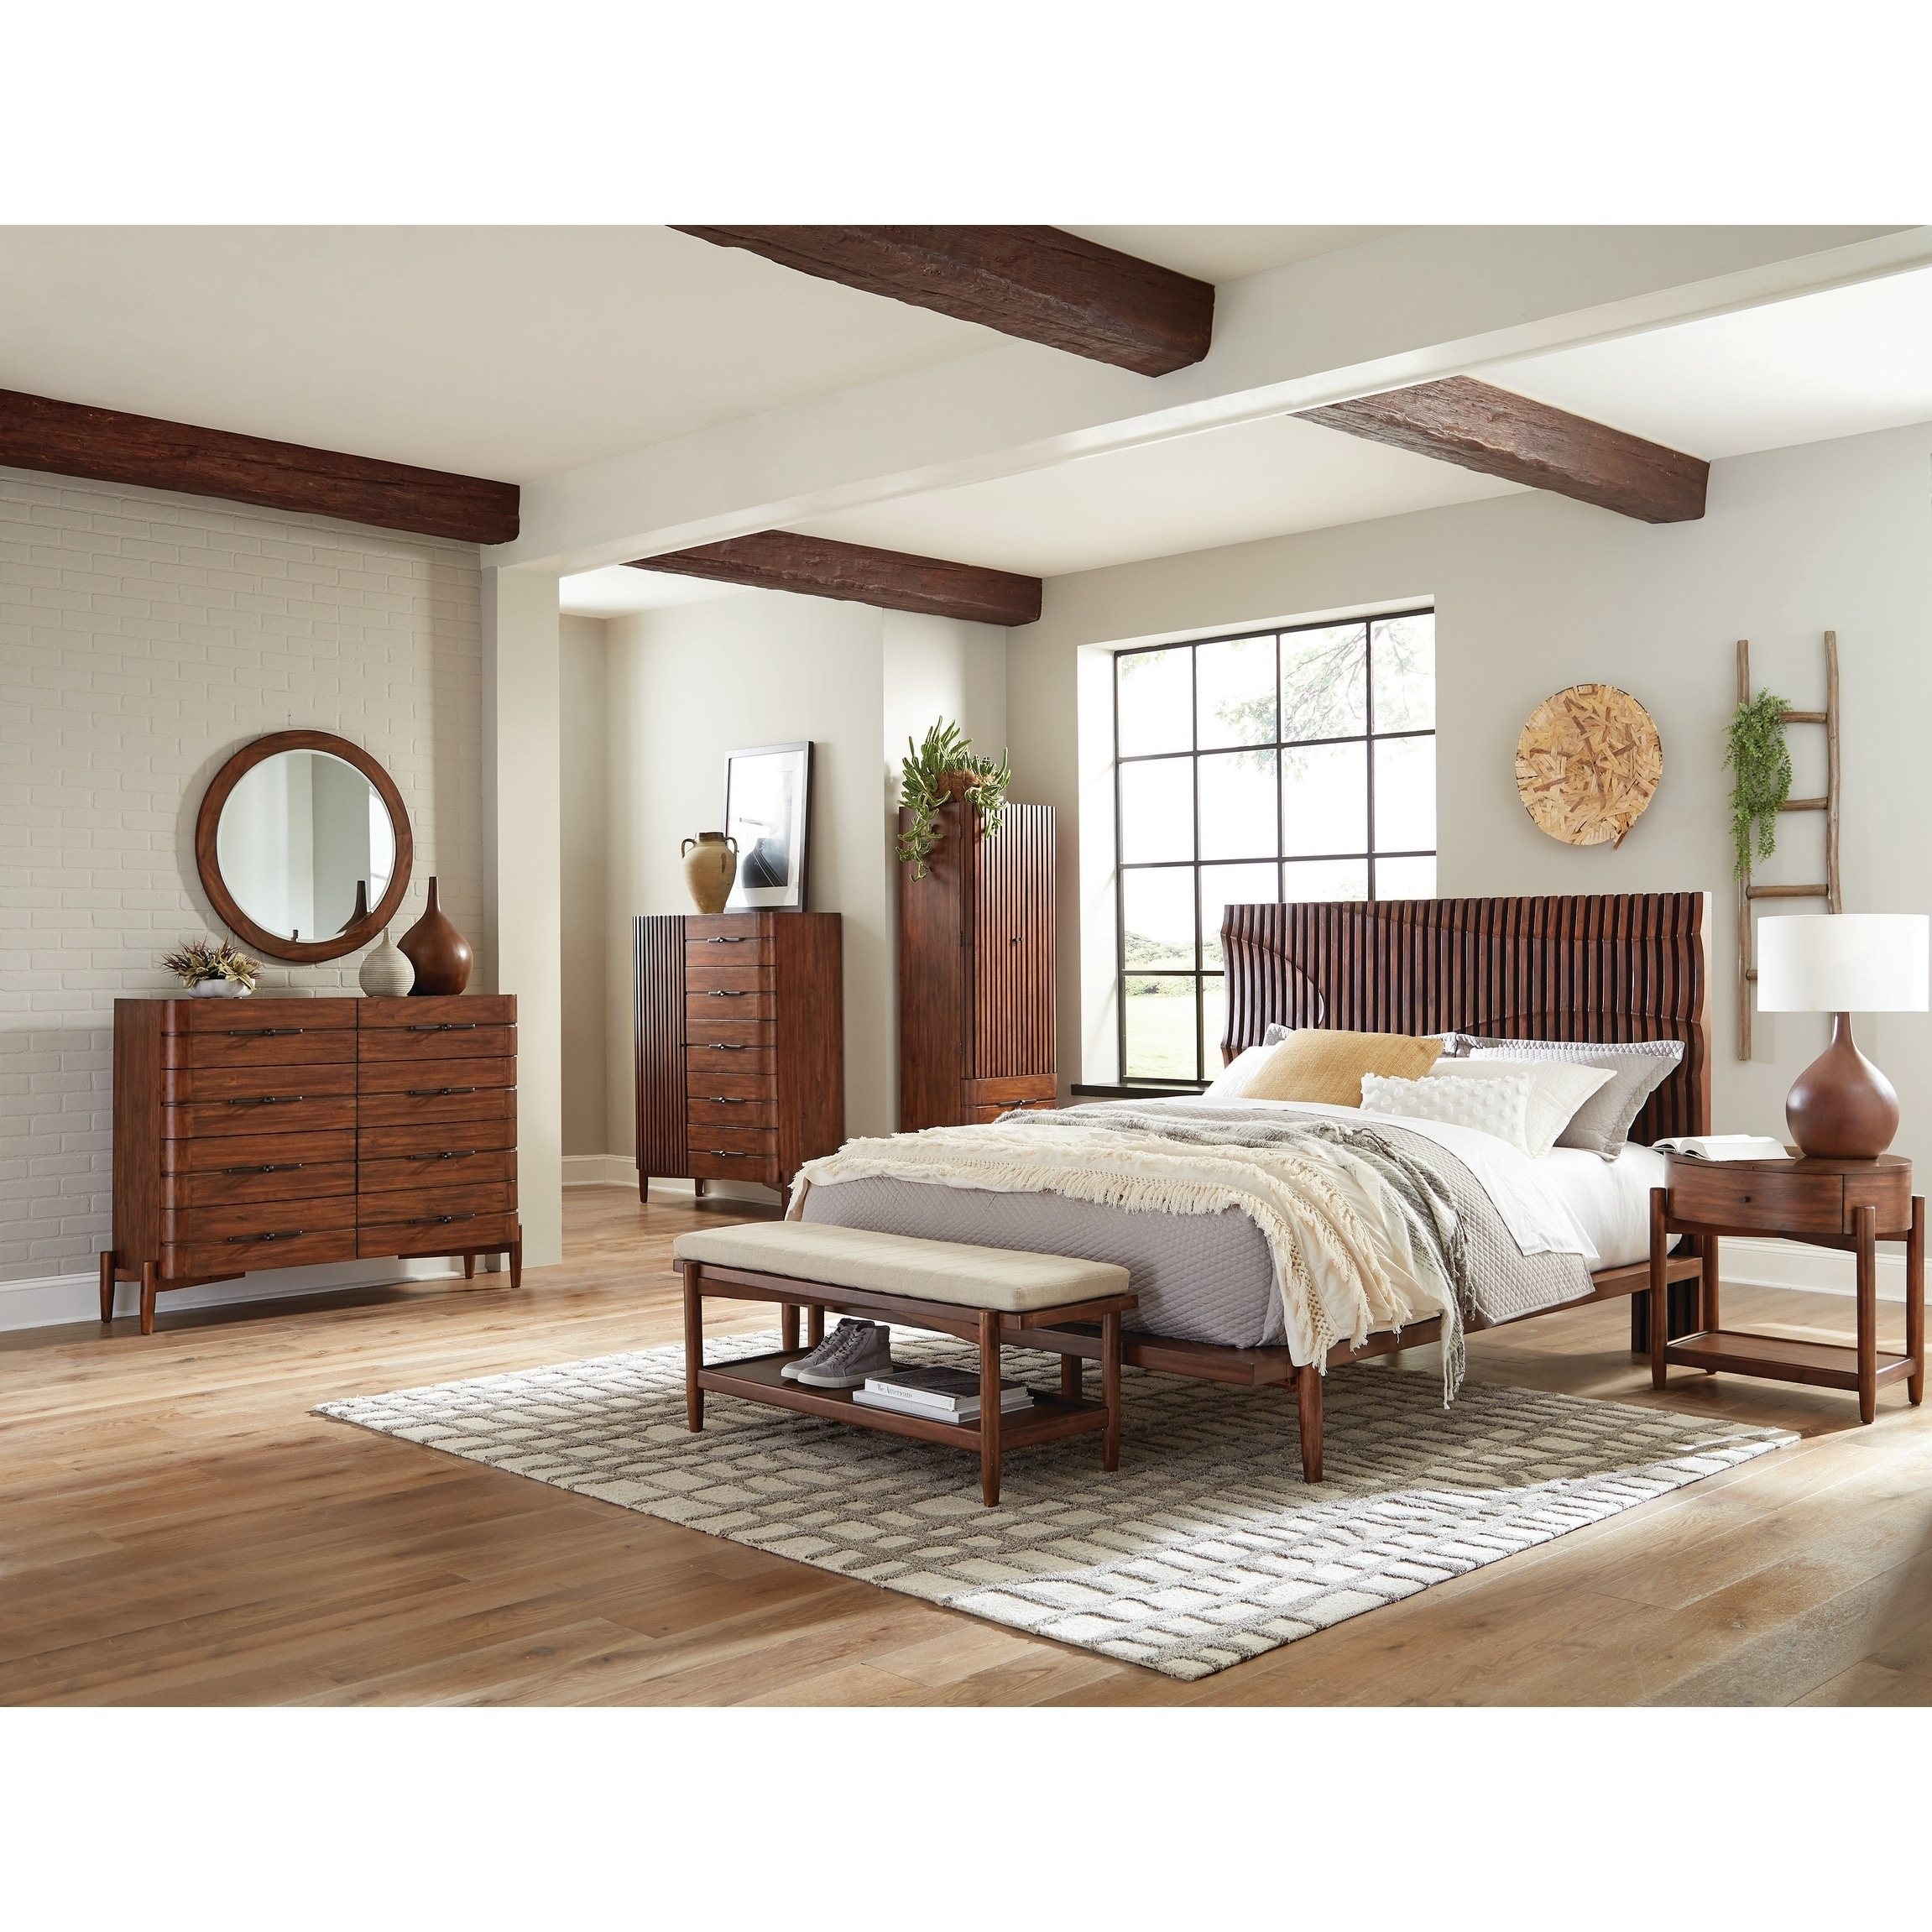 Shop Carson Carrington Hjalstad Teak 5 Piece Bedroom Set